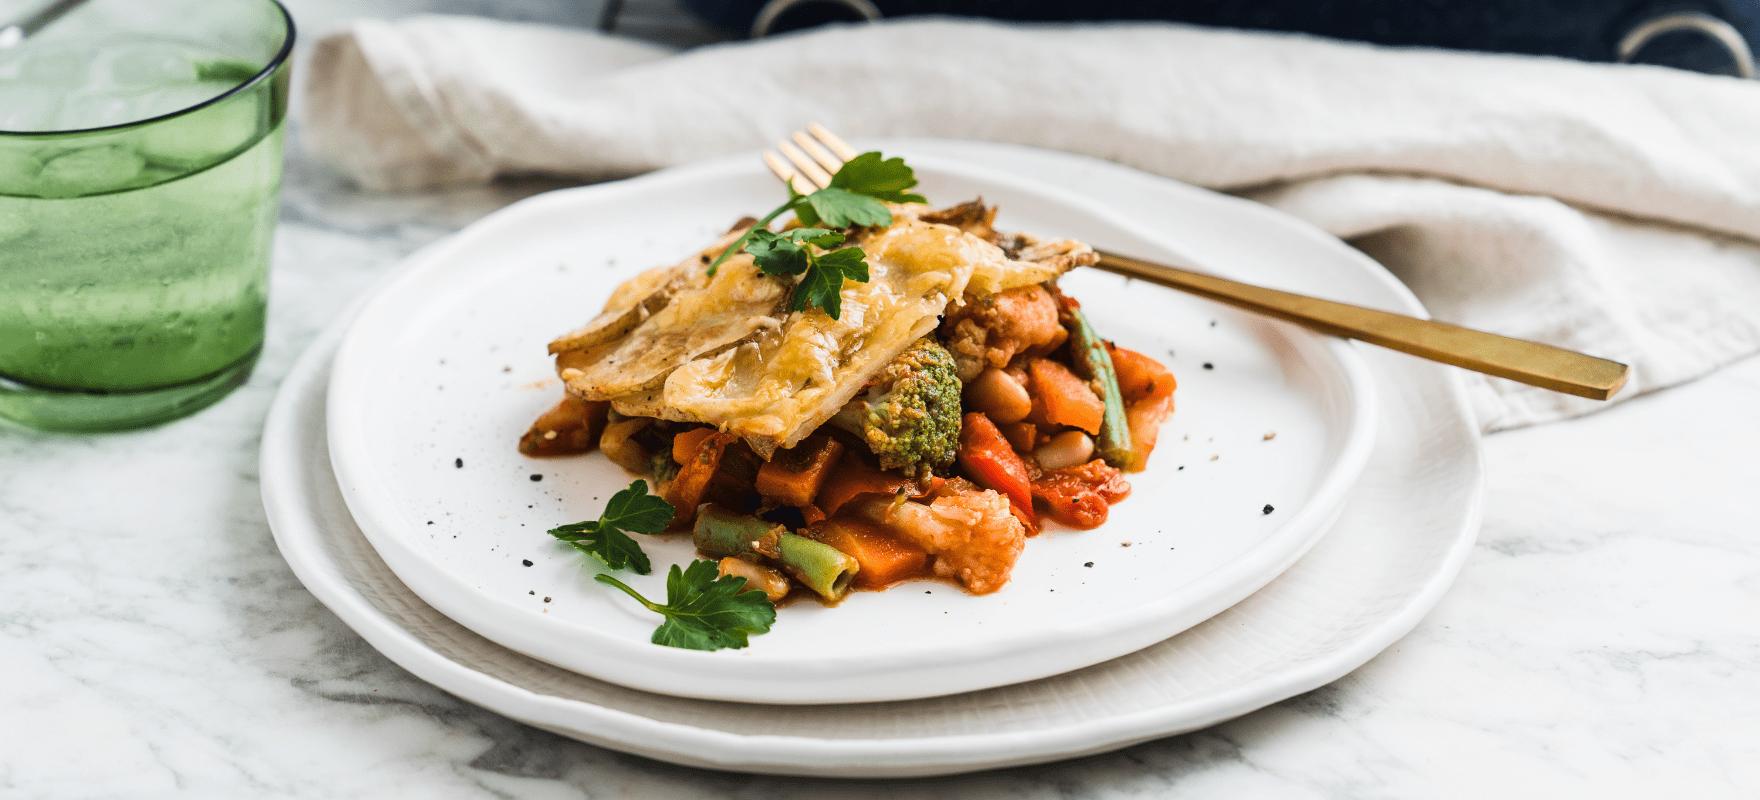 Baked vegetable casserole image 3